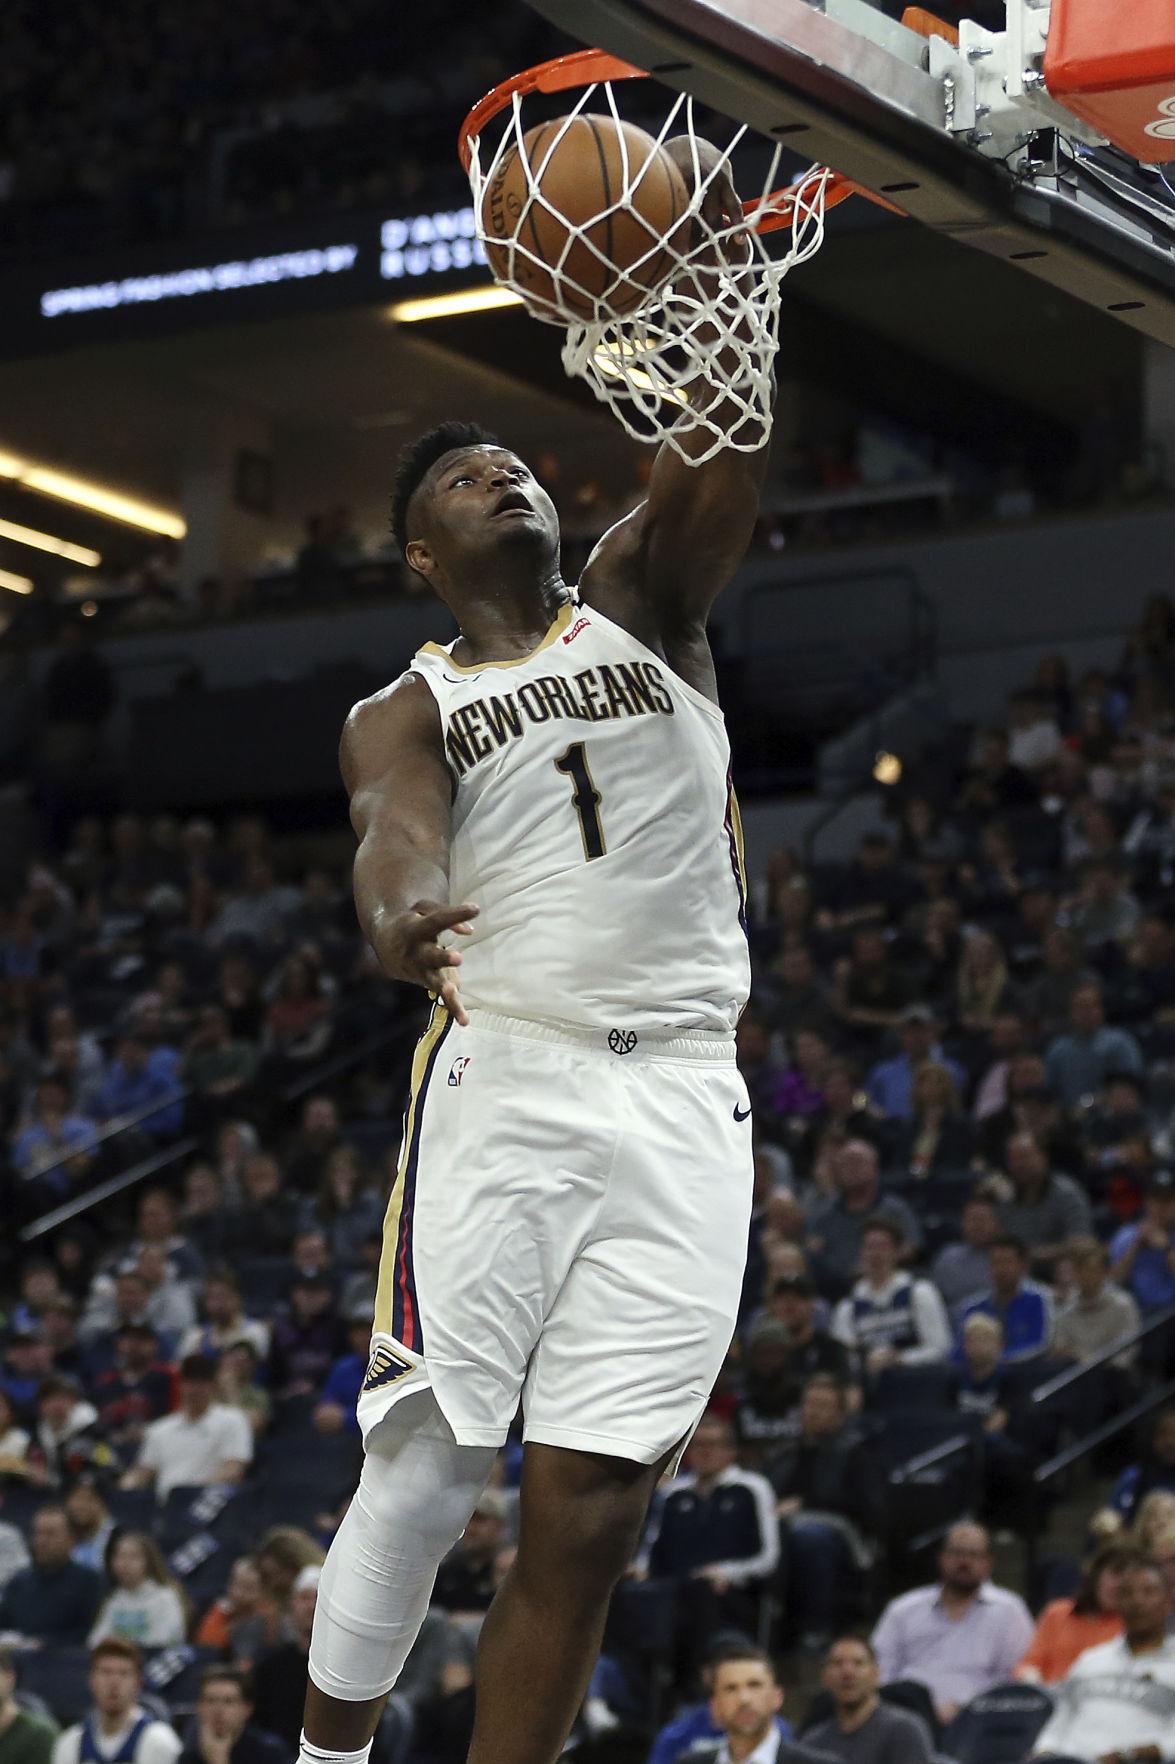 APTOPIX Pelicans Timberwolves Basketball